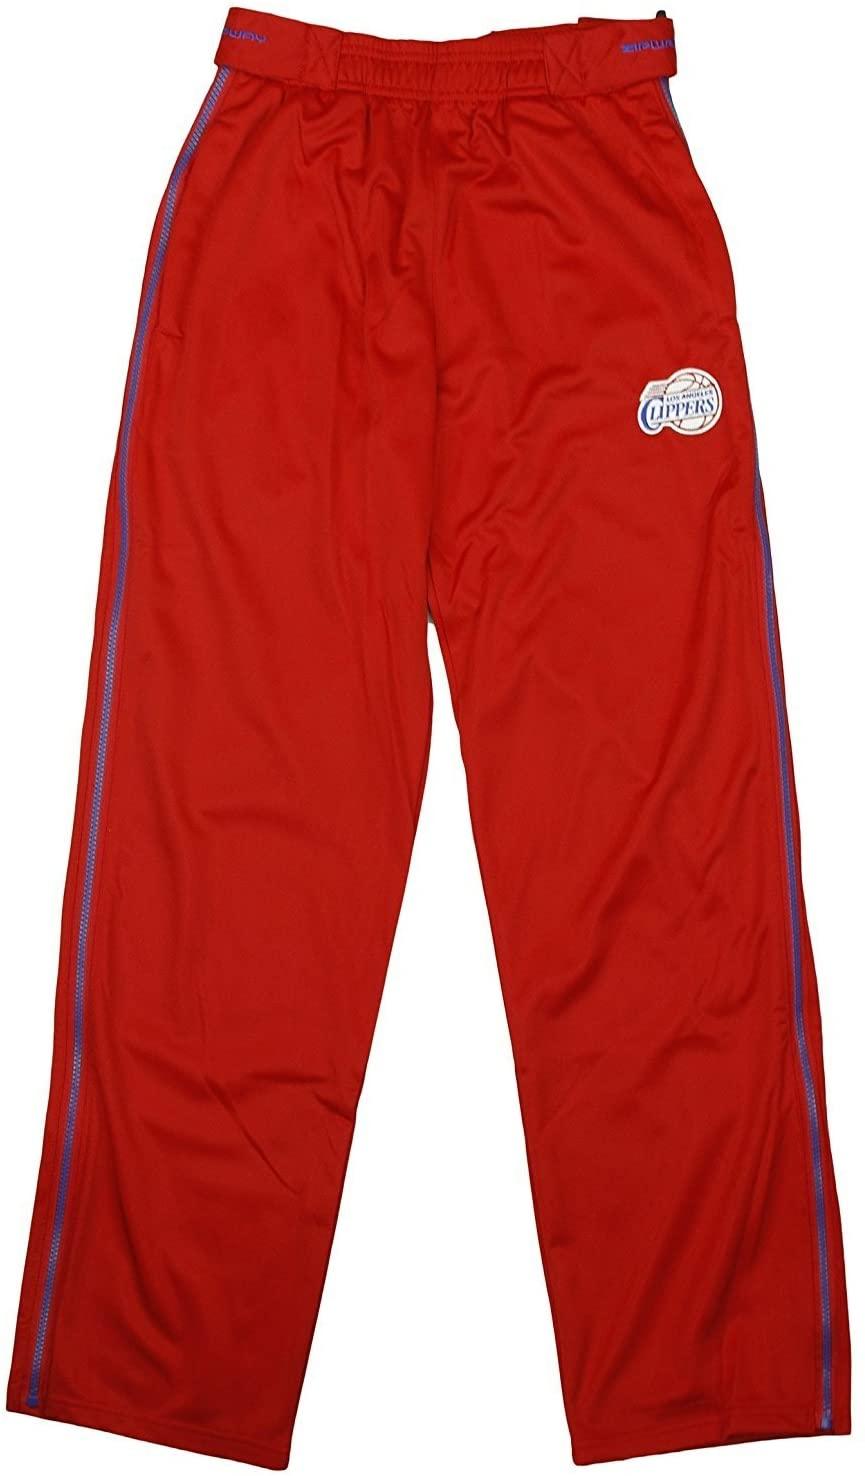 Zipway Los Angeles Clippers NBA Big Boys Tearaway Pants, Red